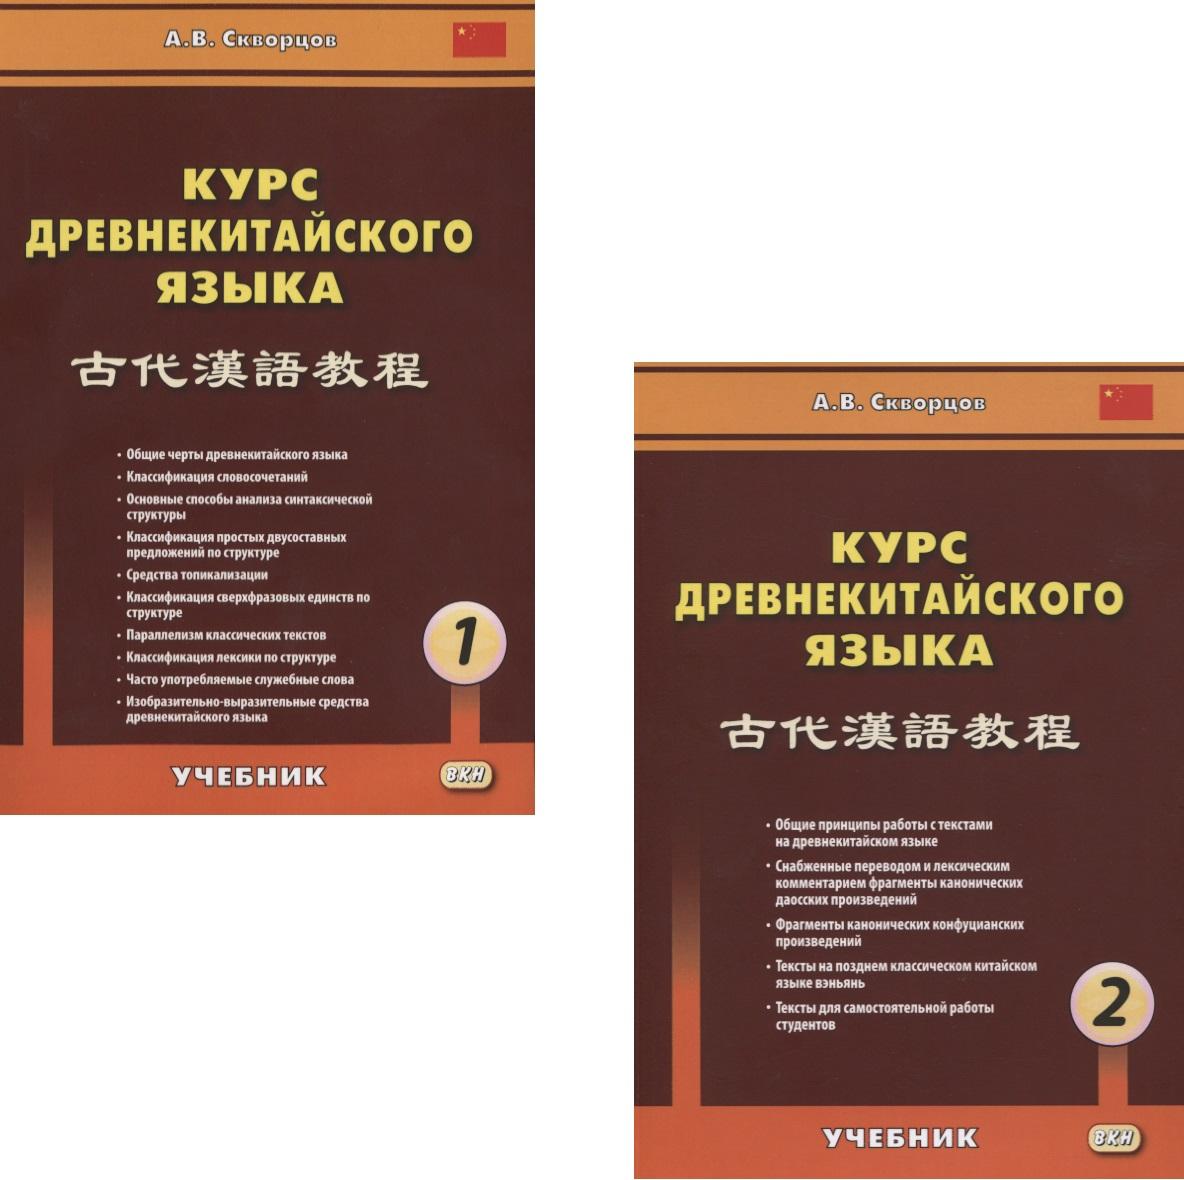 Курс древнекитайского языка (комплект из 2 книг)